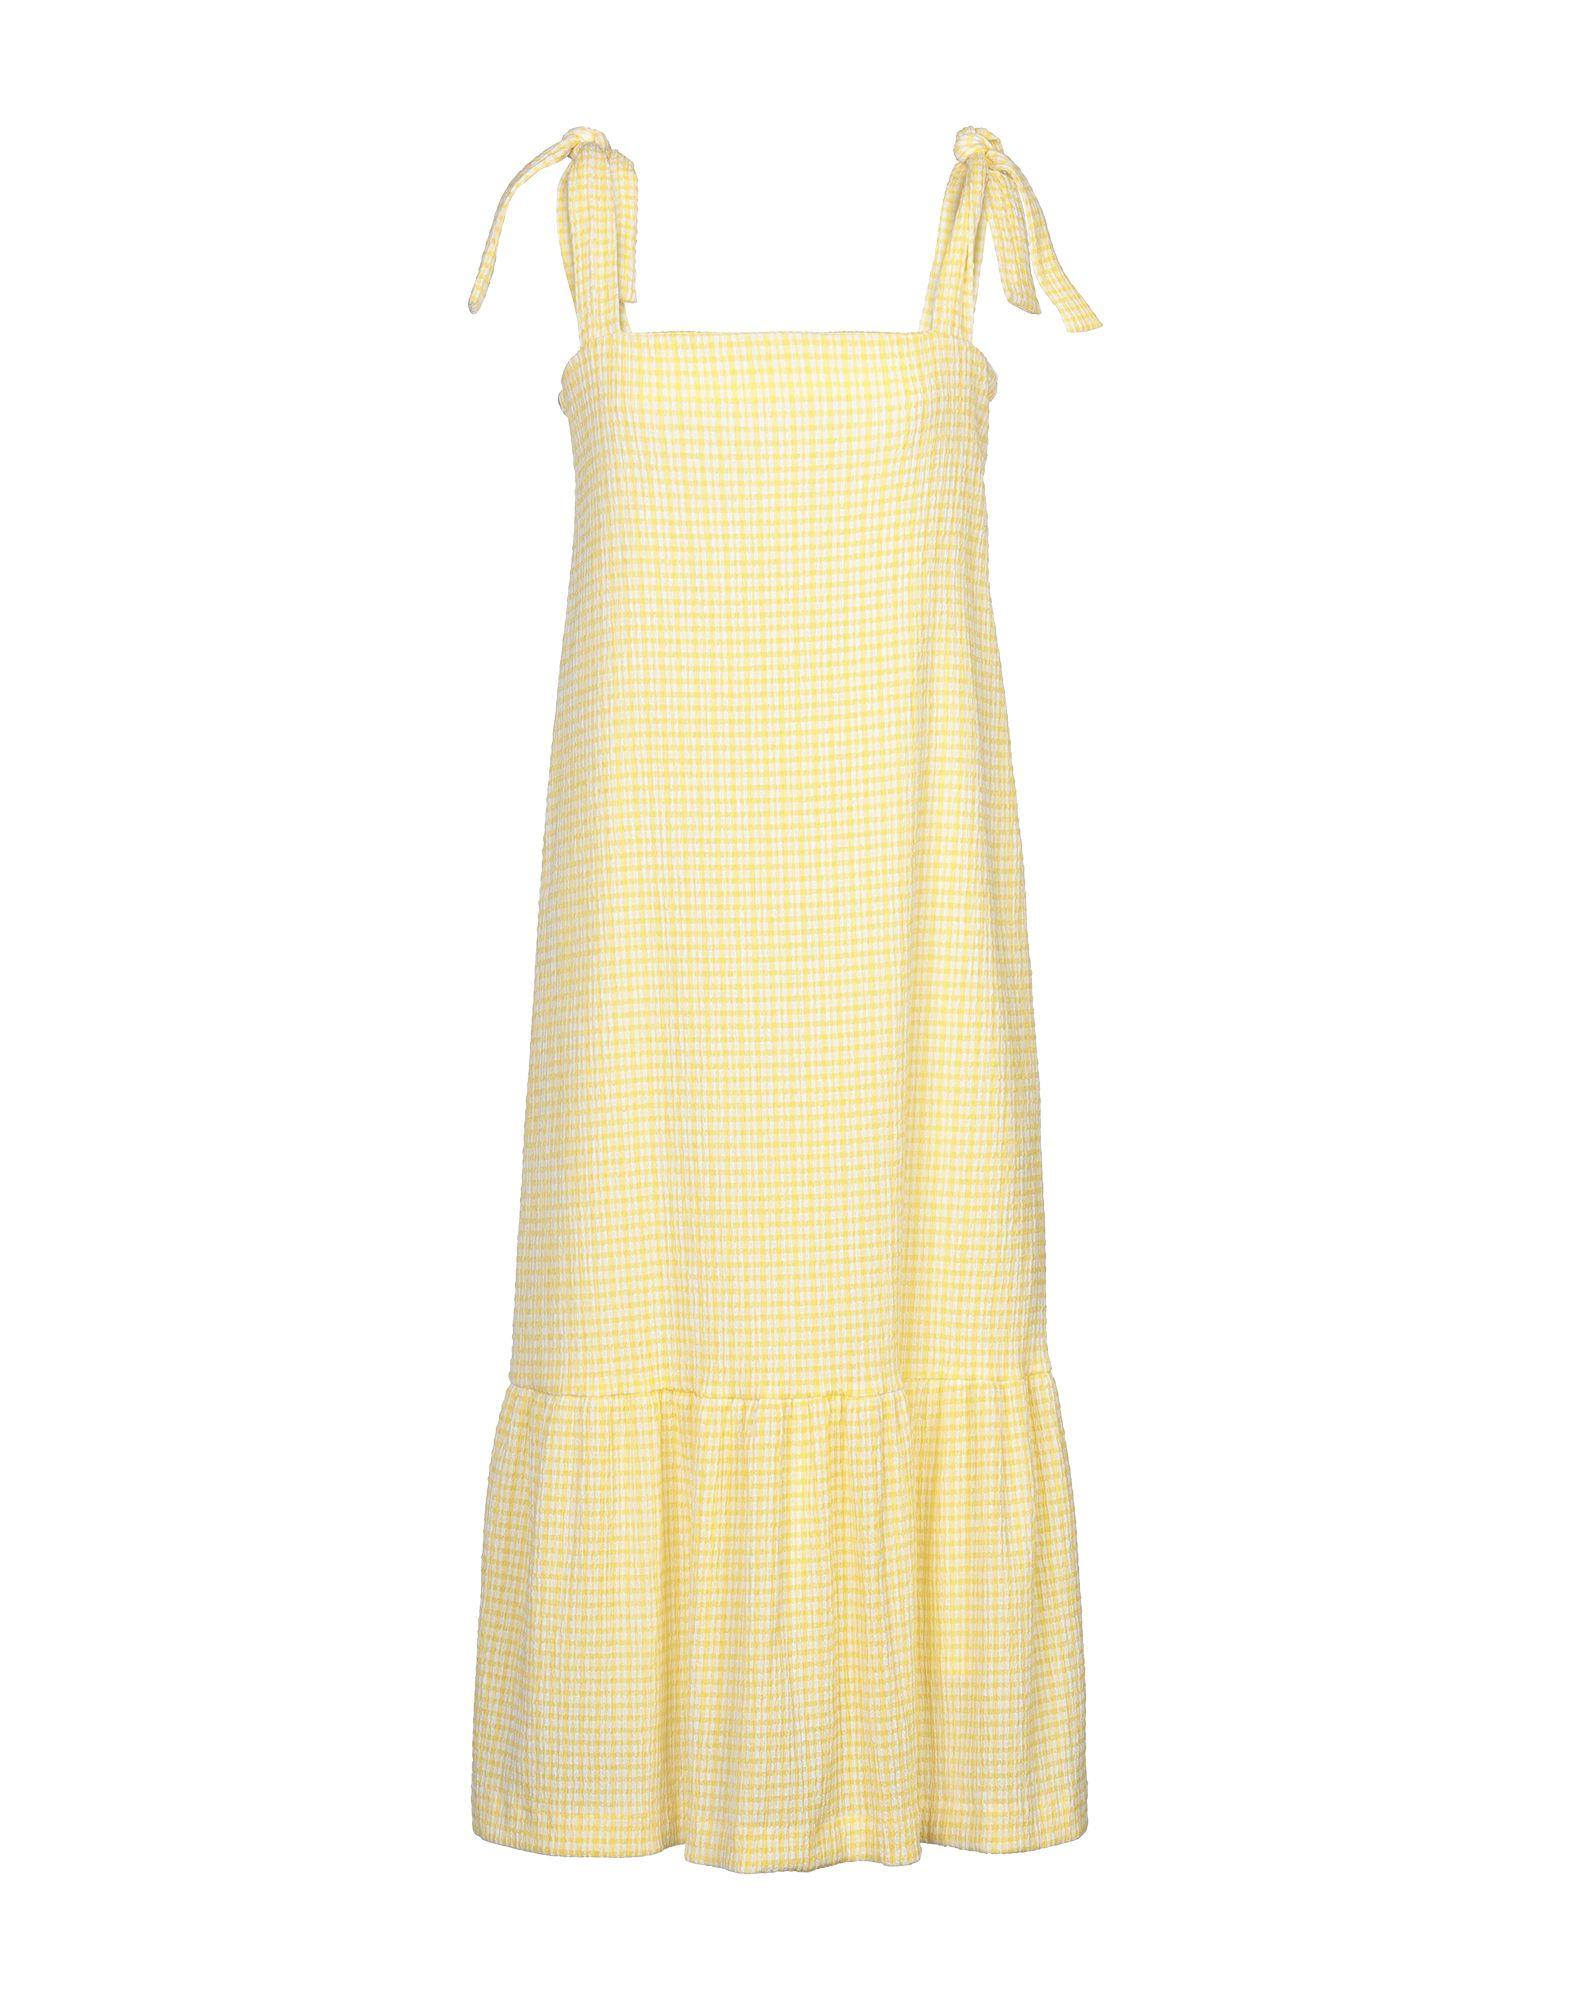 HARRIS WHARF LONDON Платье длиной 3/4 fallen wharf 3 beanie